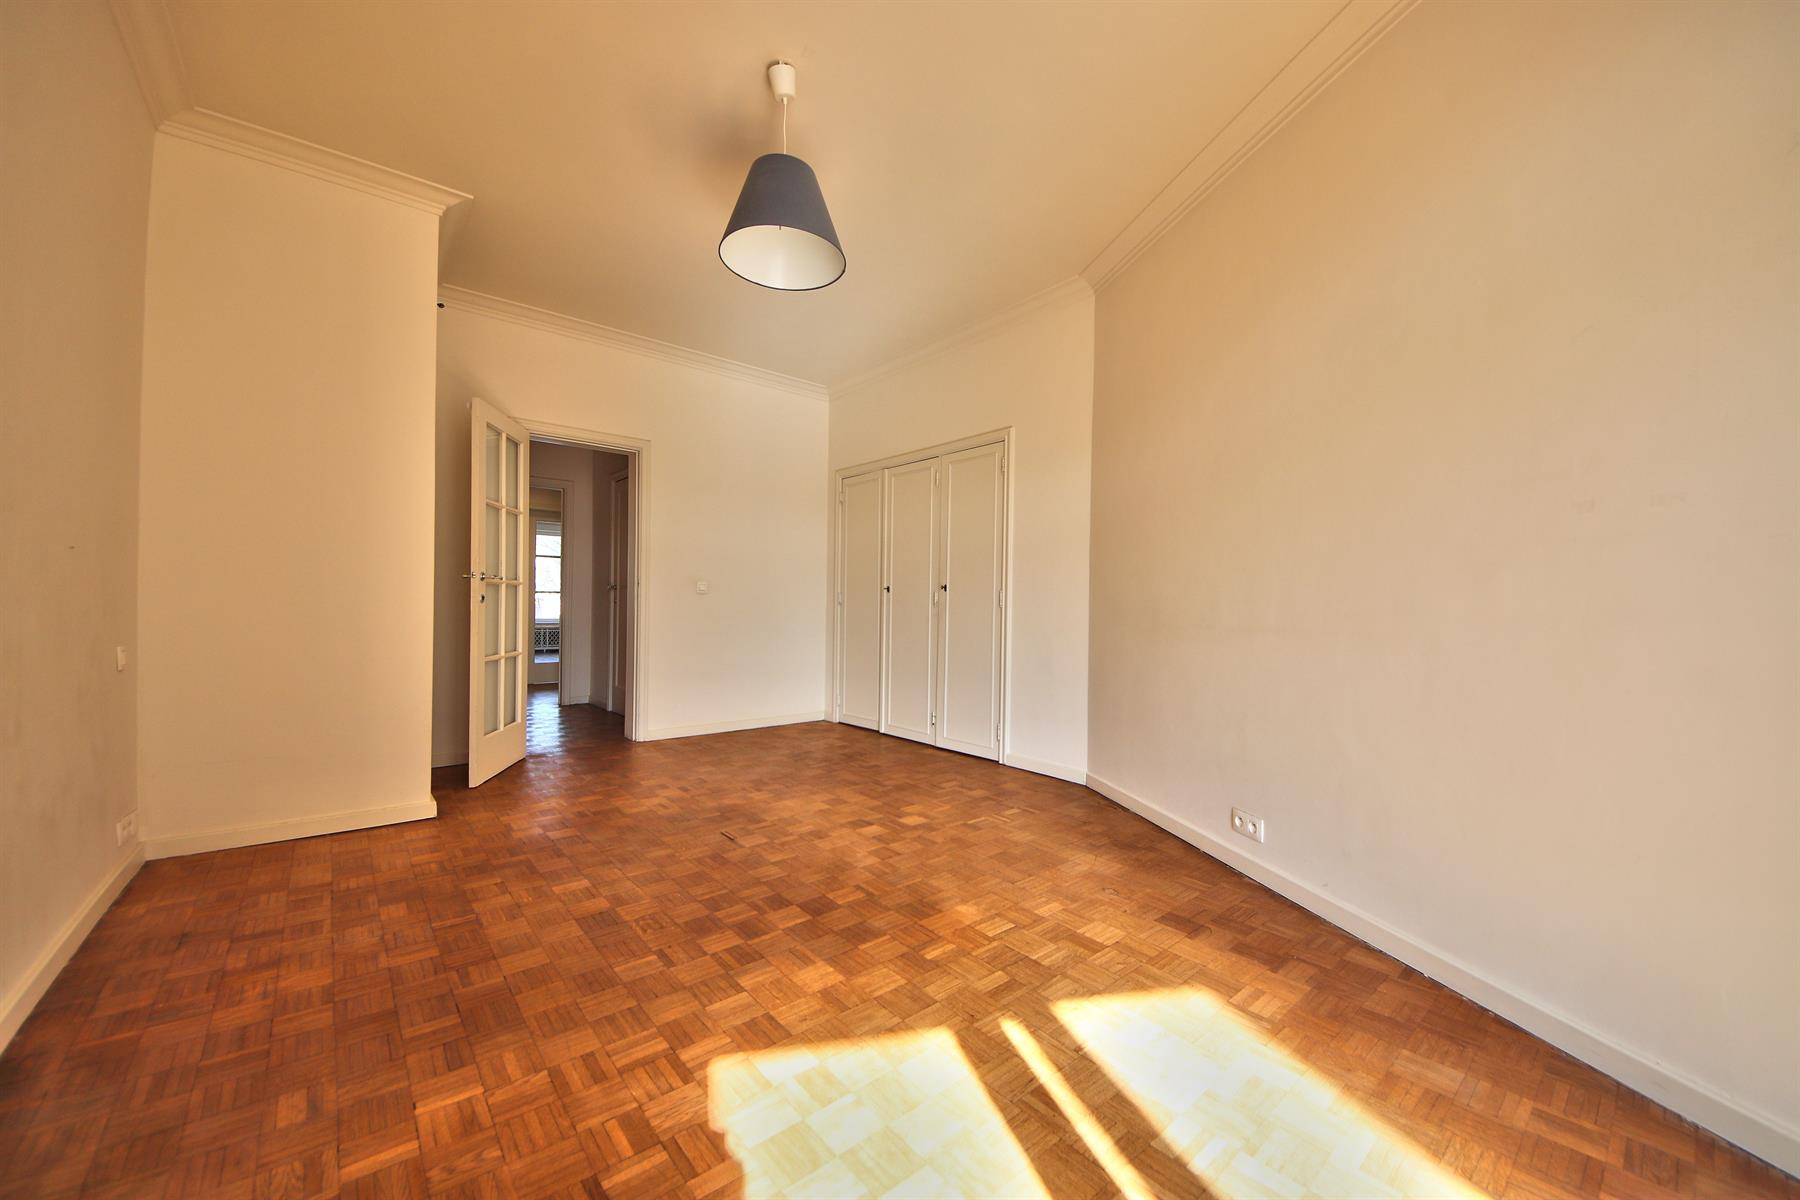 Flat - Etterbeek - #4322663-6